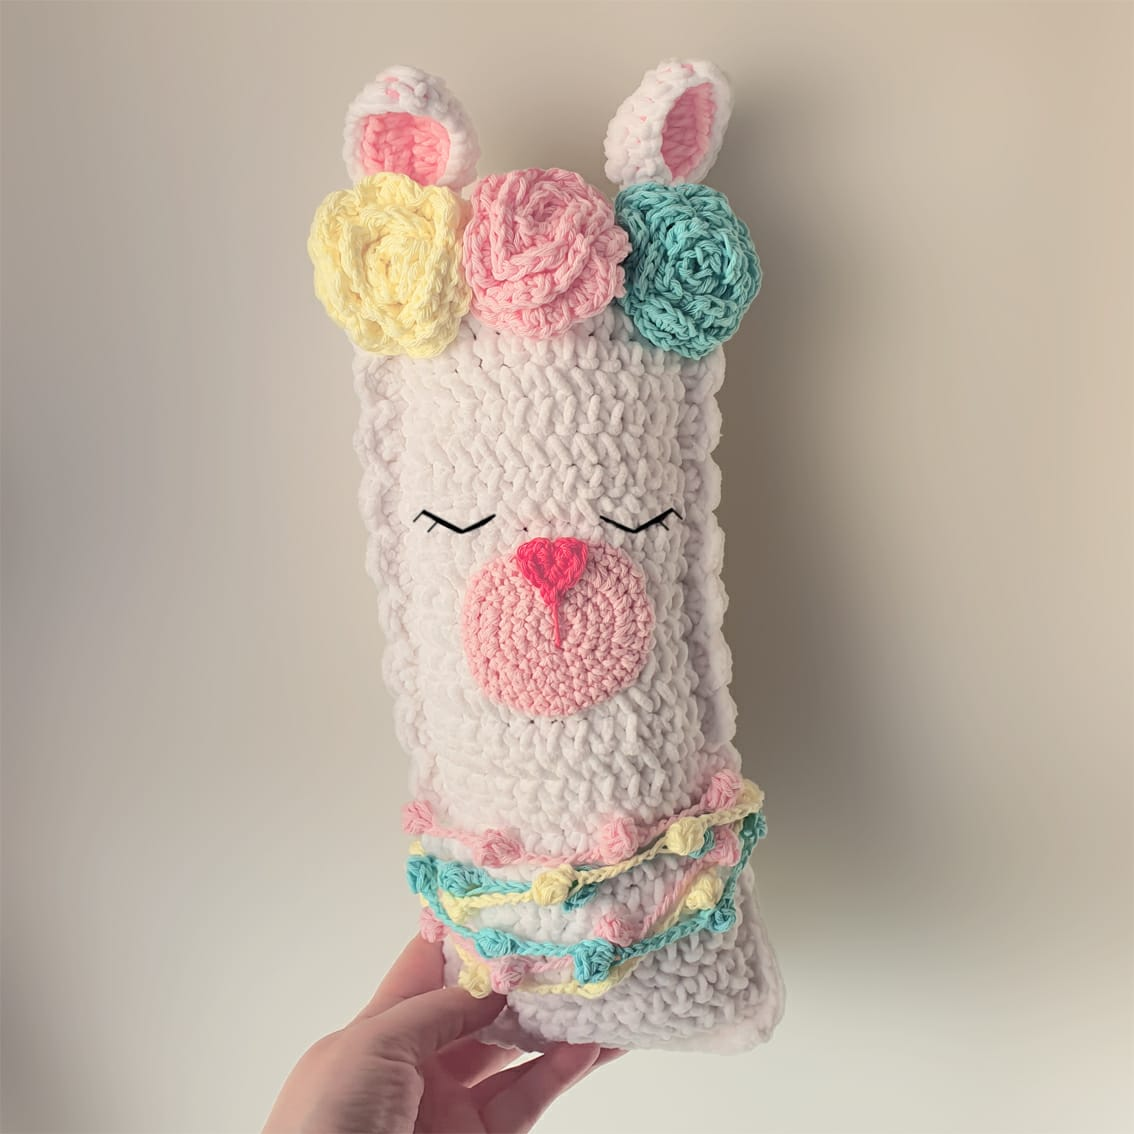 llamas tejidas a crochet paso a paso لم يسبق له مثيل الصور + tier3.xyz | 1134x1134